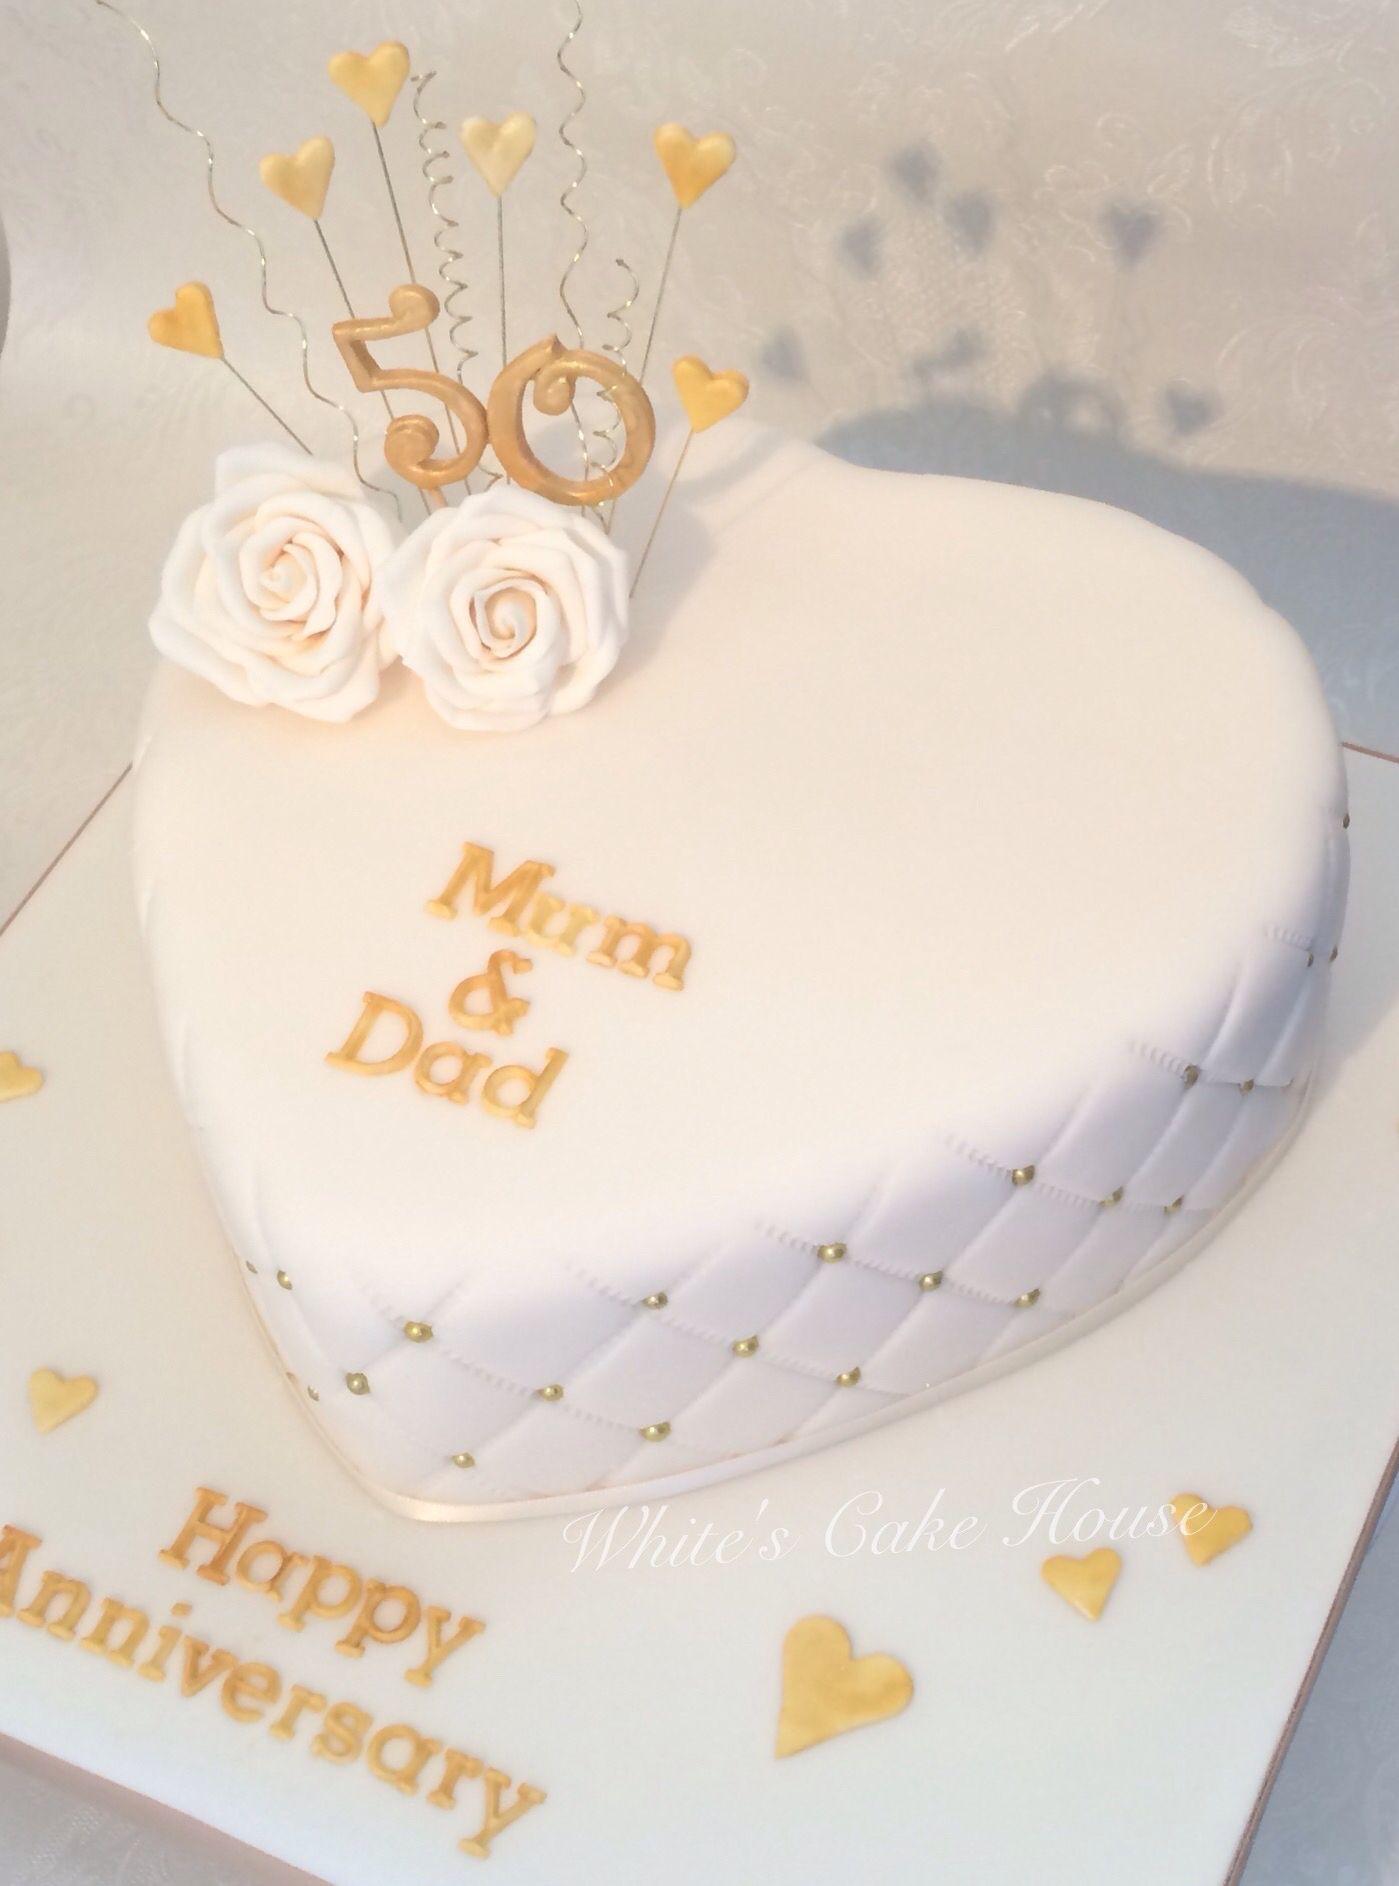 Heart Shaped Golden Anniversary Cake